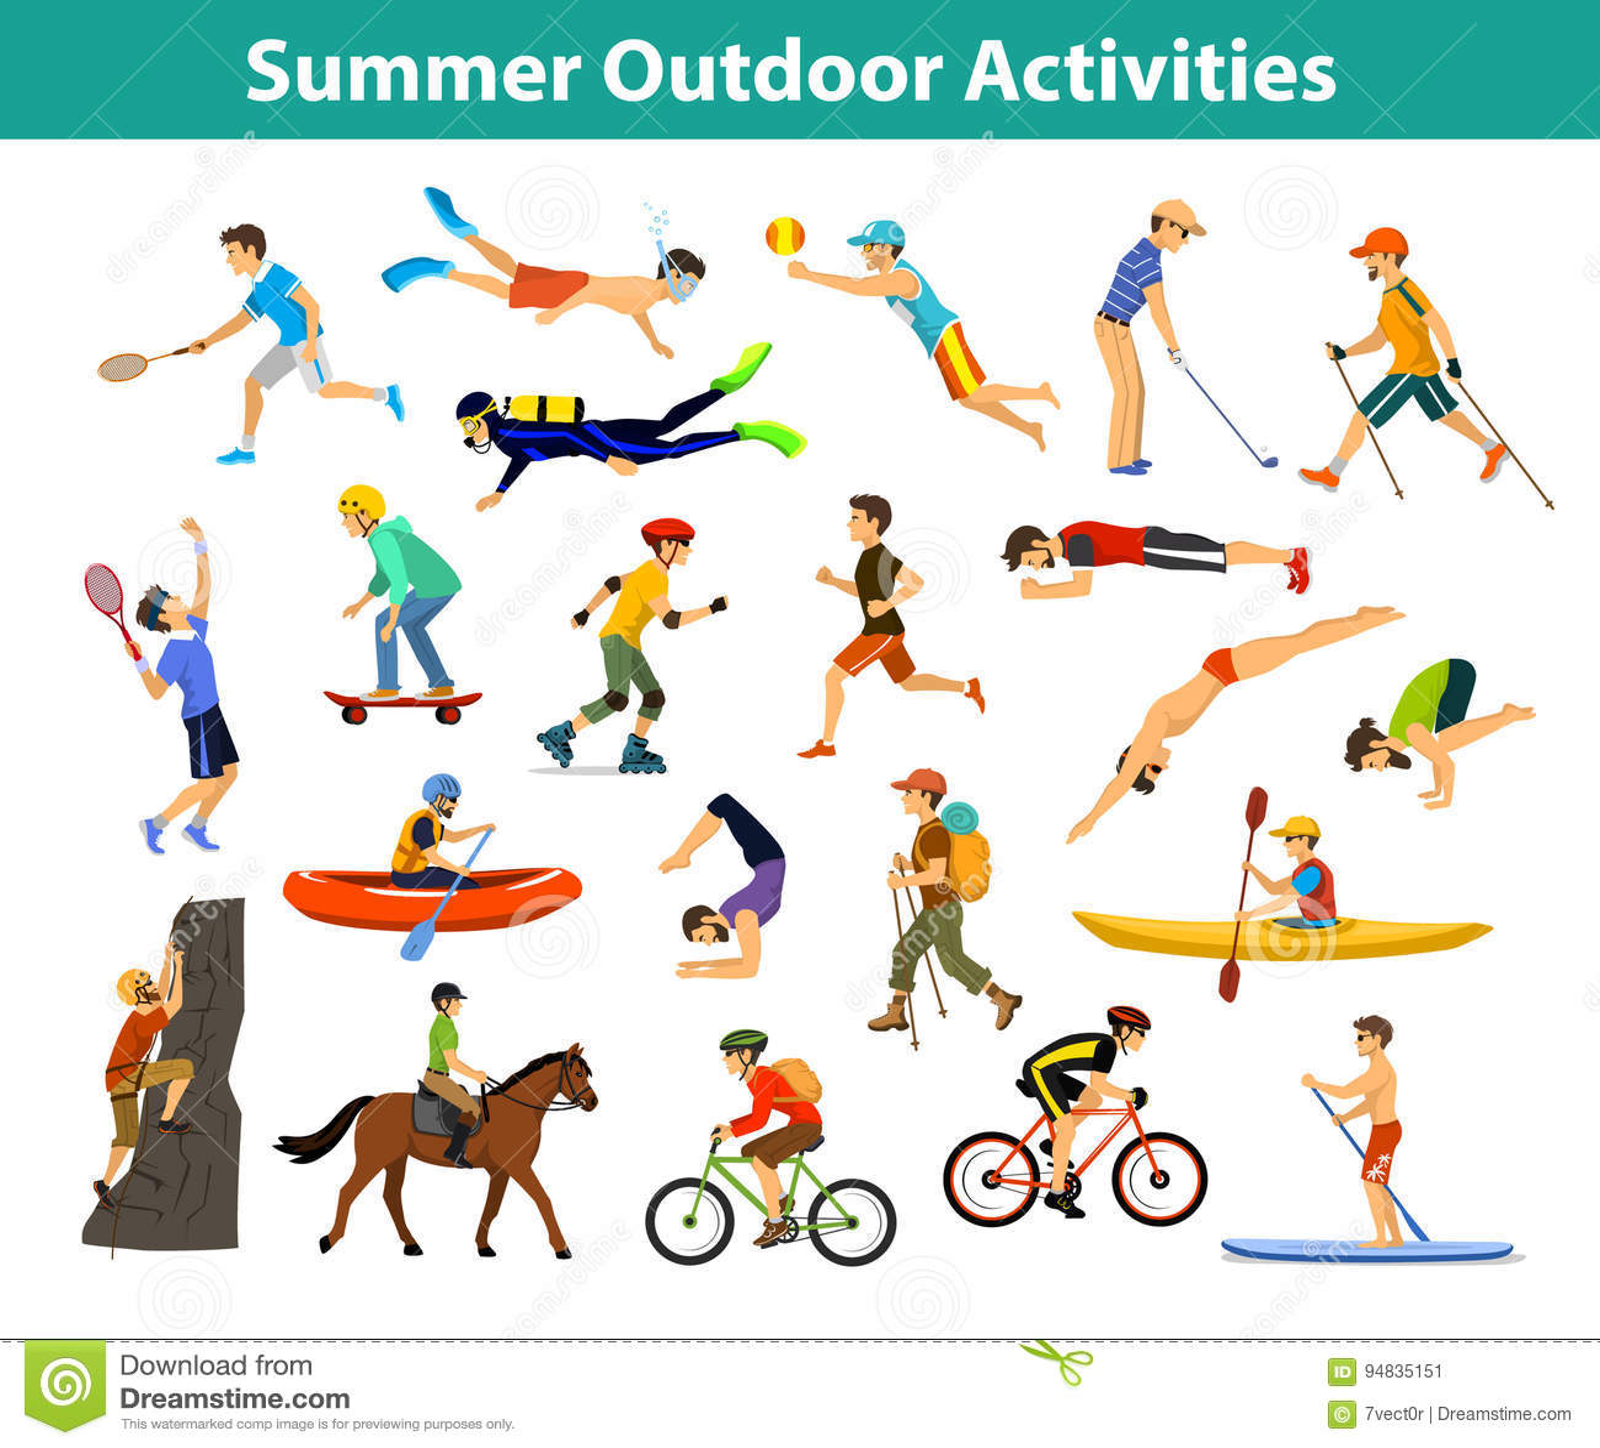 Summer Outdoor Sports And Activities Stock Vector